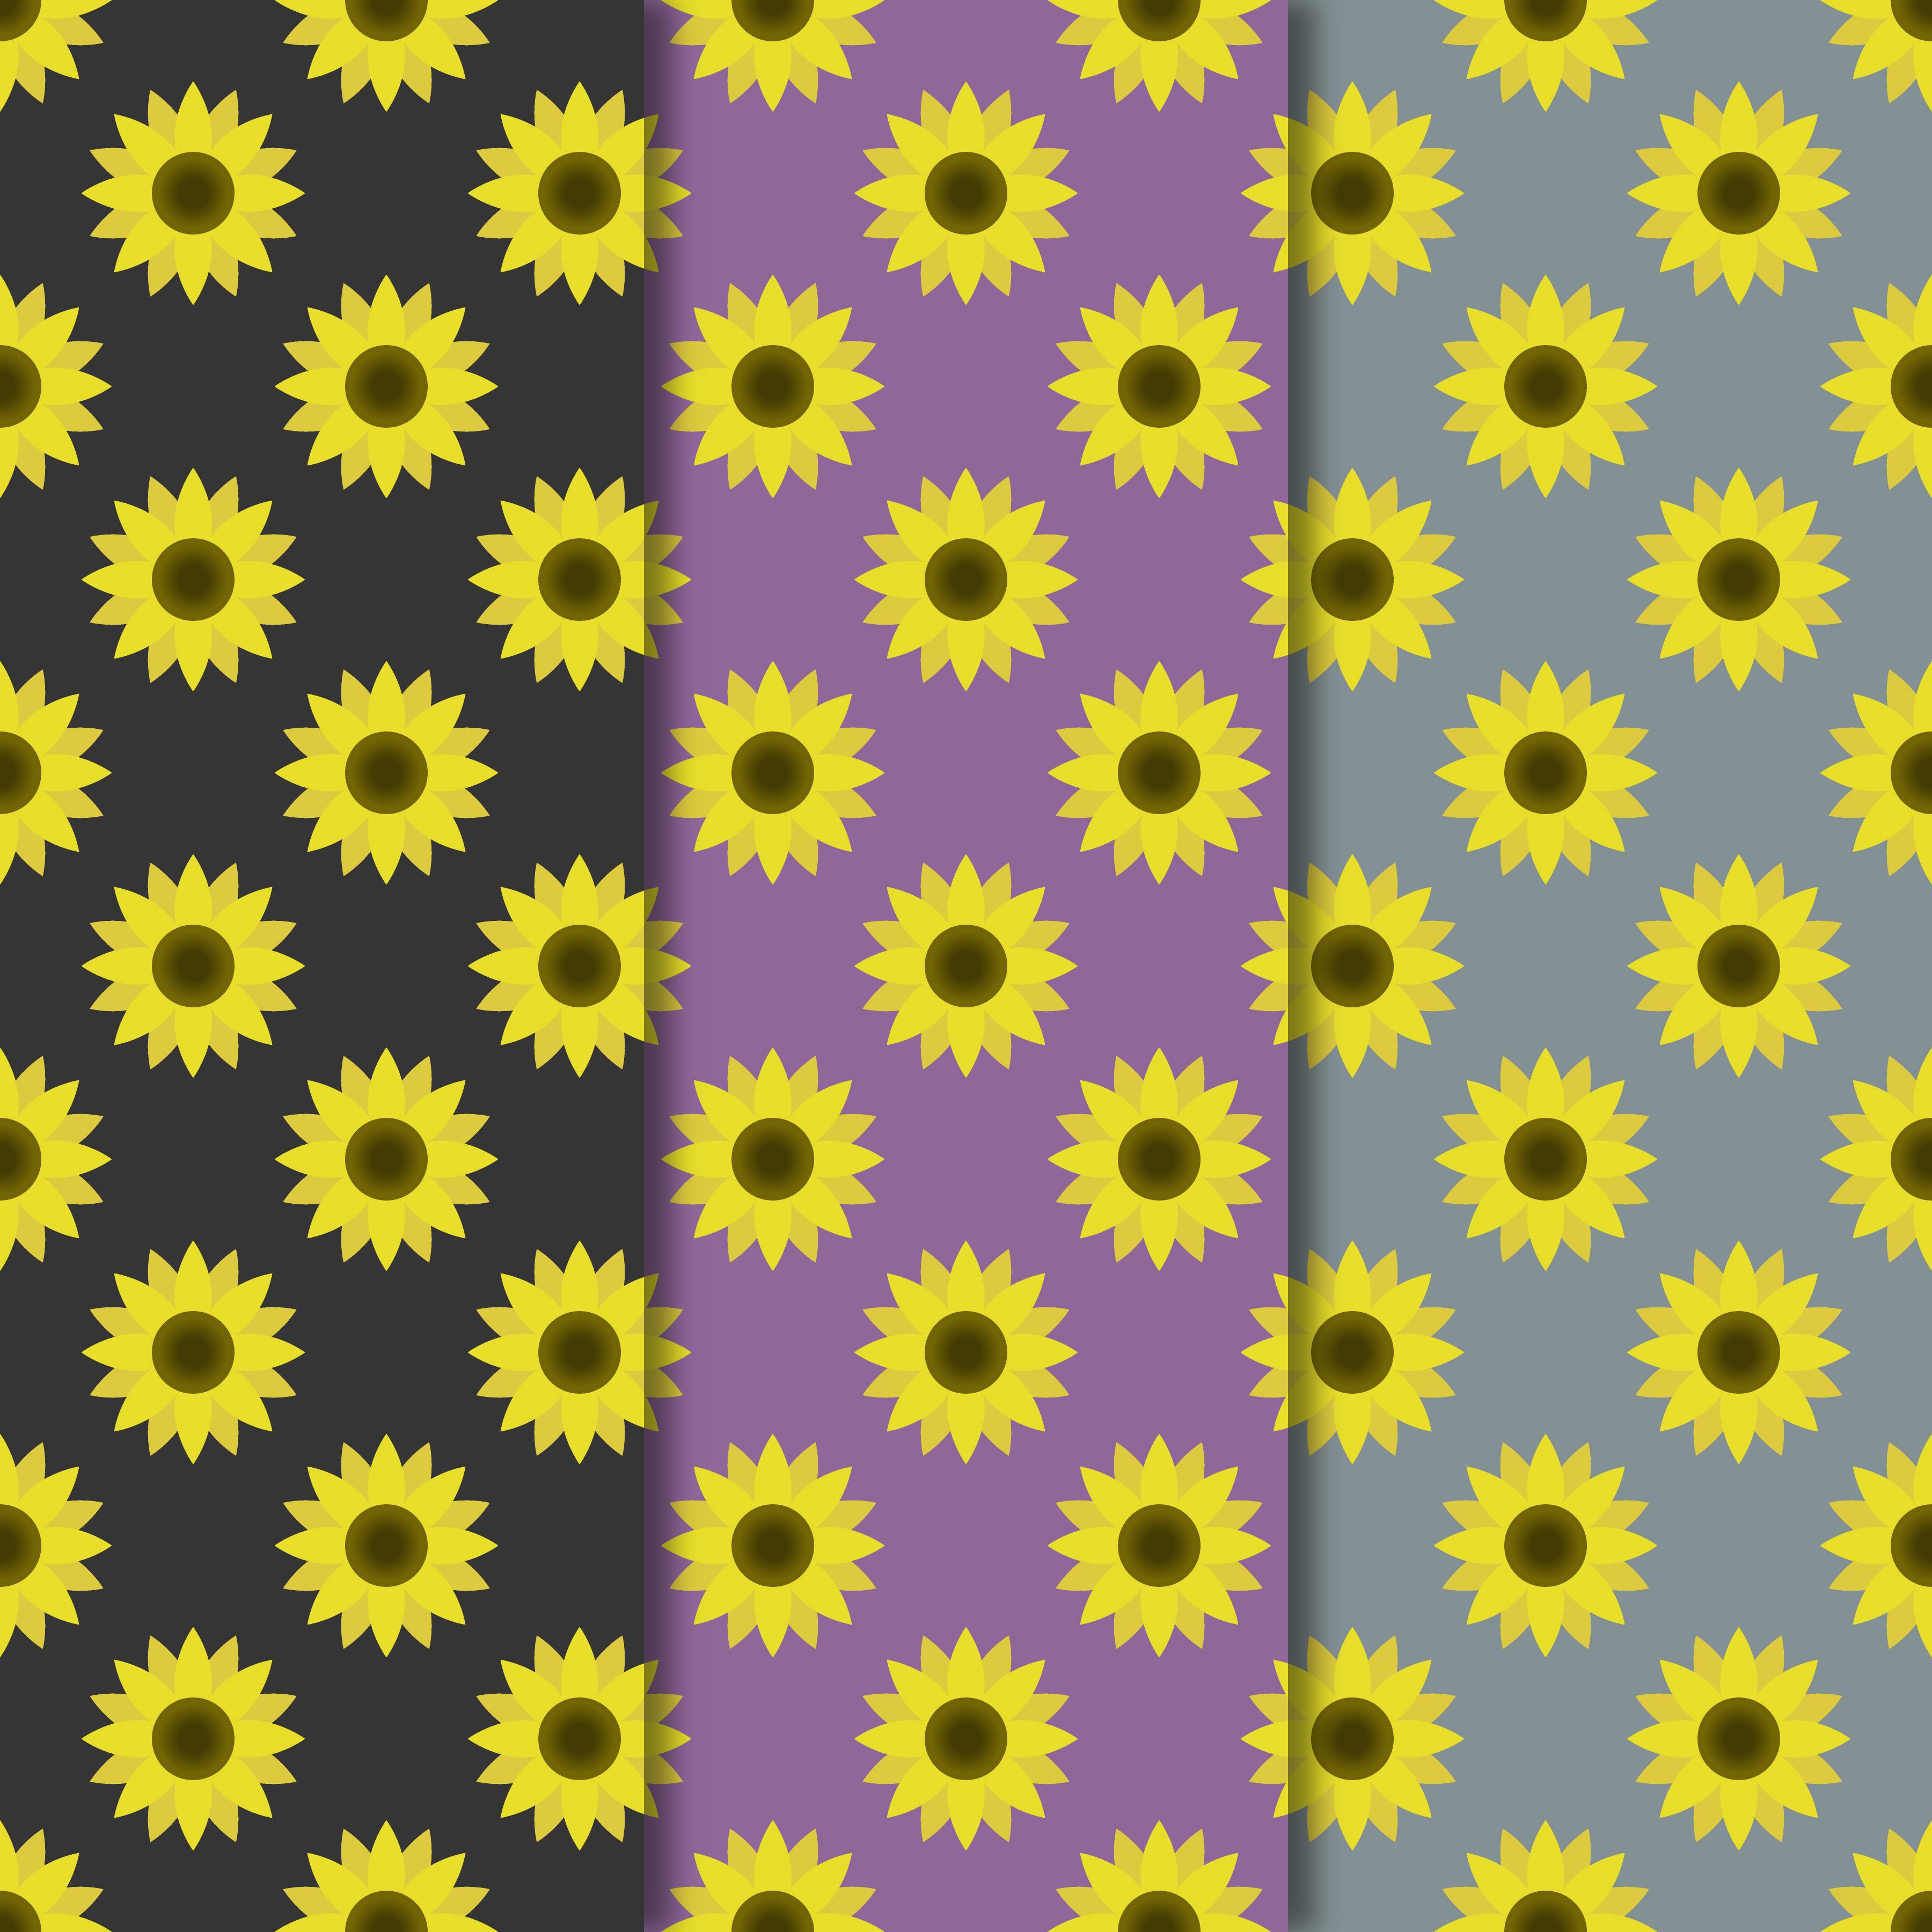 Blooming Sunflowers Digital Paper example image 2